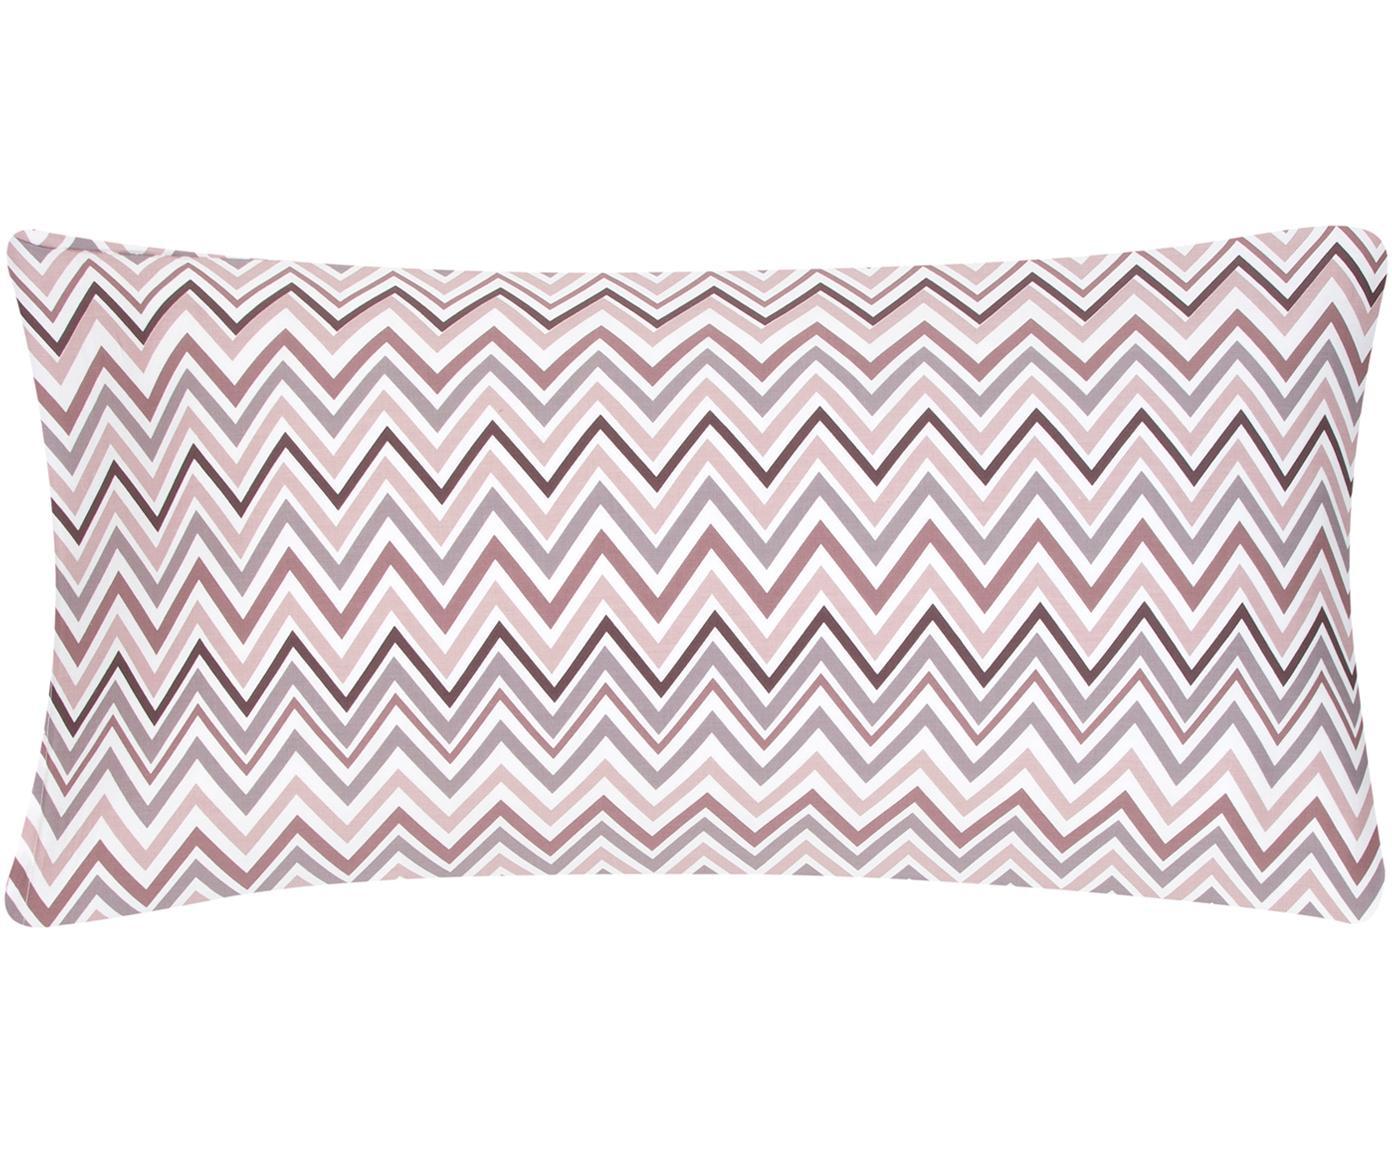 Baumwollsatin-Kissenbezüge Maui mit Zickzack-Muster, 2 Stück, Webart: Satin Fadendichte 200 TC,, Weiß, Mauve, 40 x 80 cm